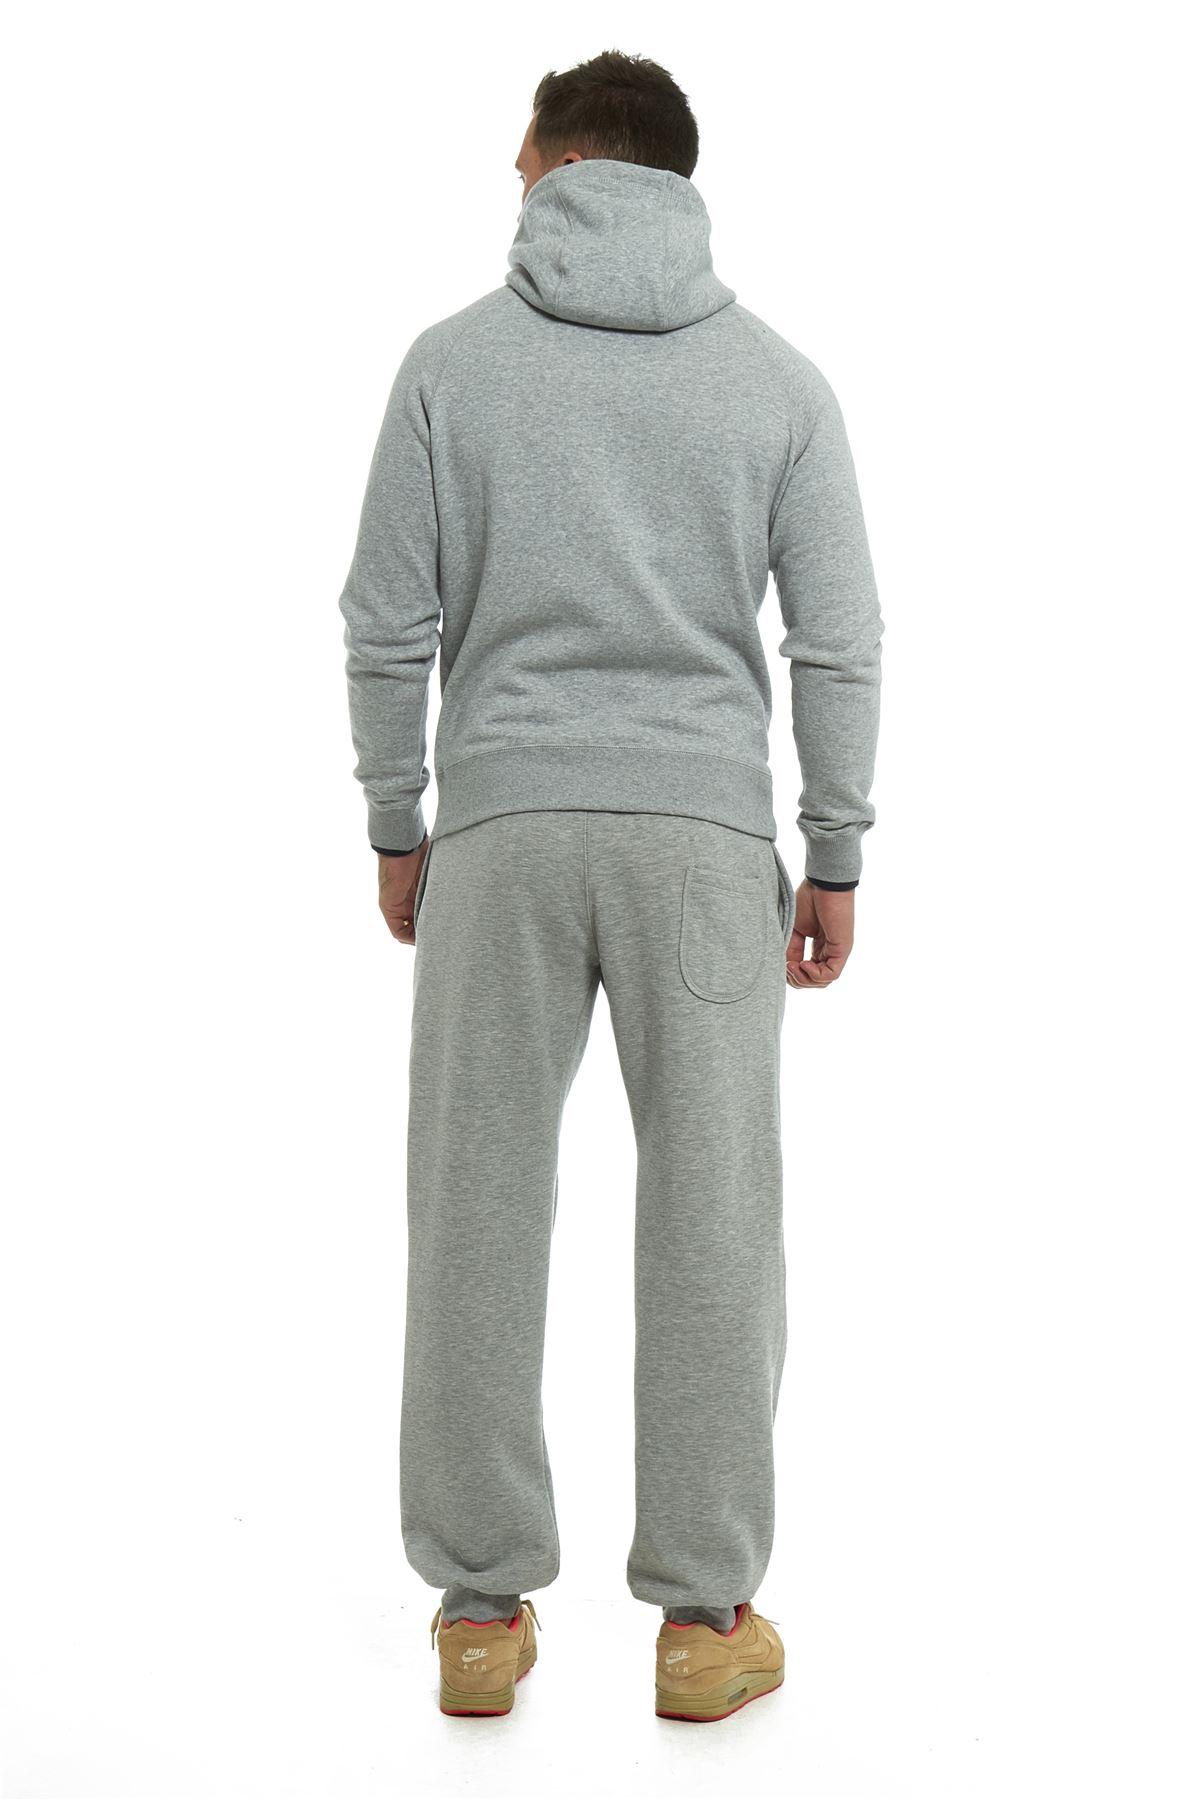 Blank Men's Microfiber Fleece Lined Top & Bottom Set MHS100